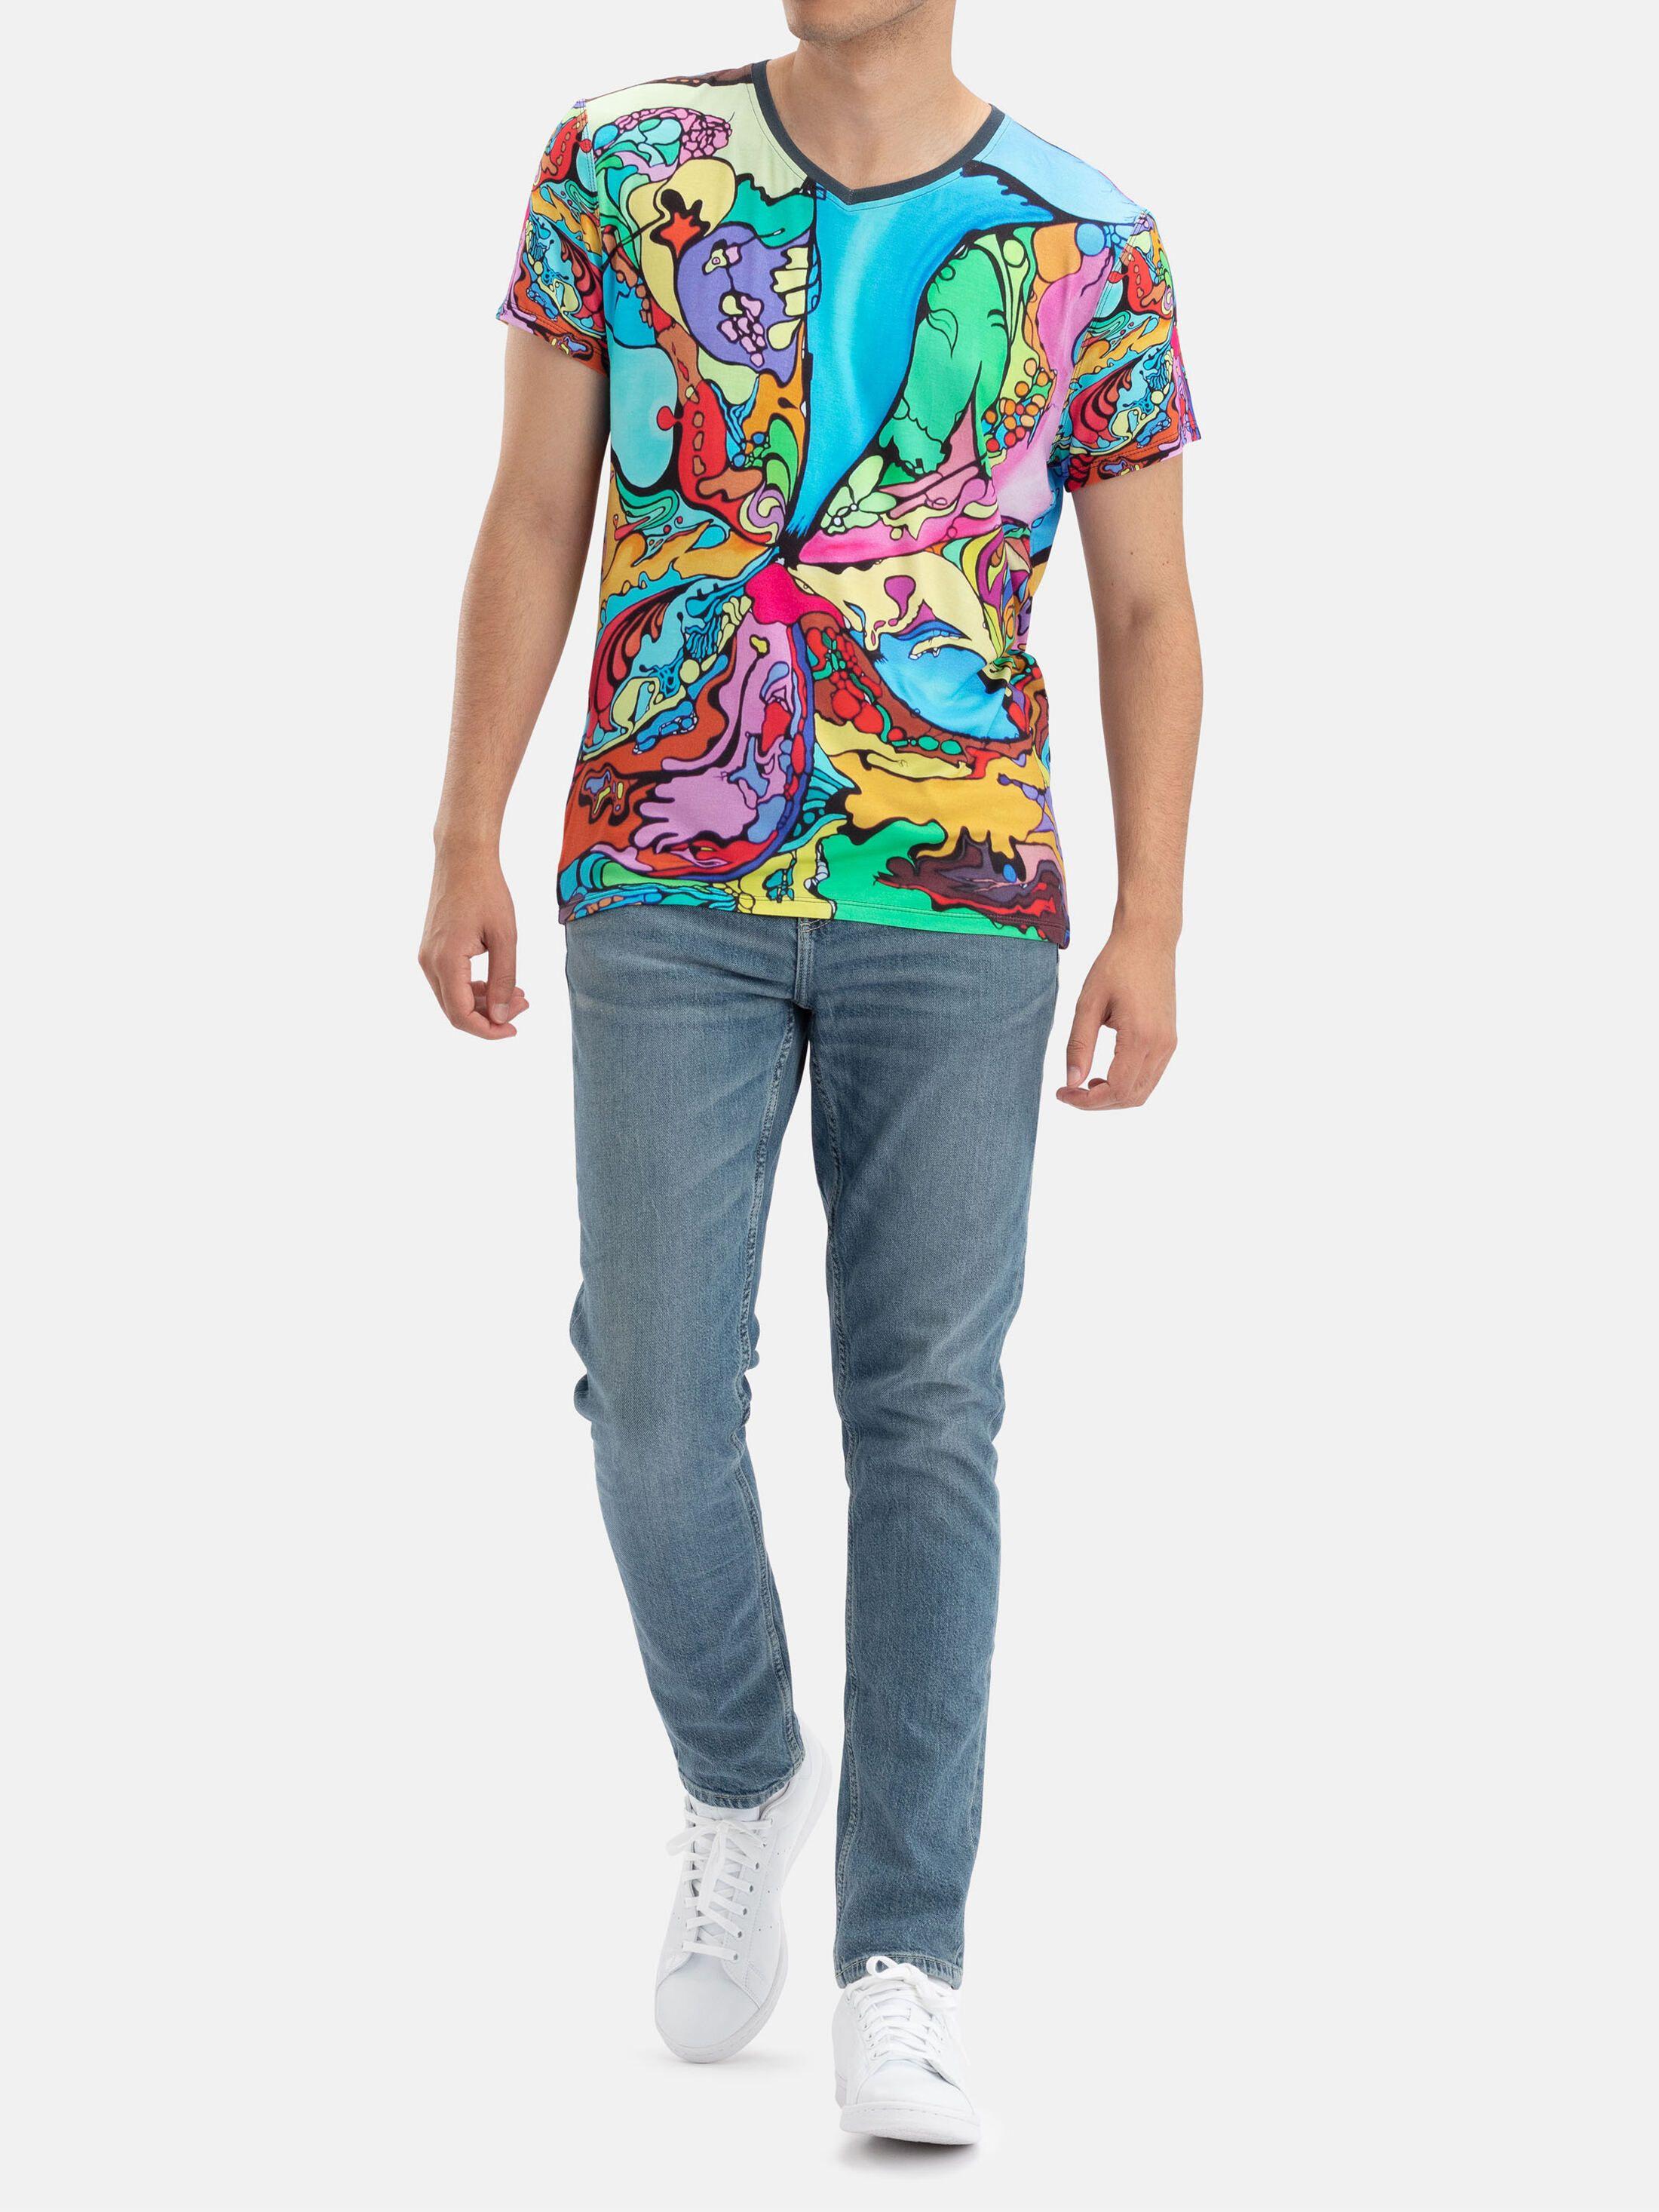 Custom Men's V Neck T-Shirts